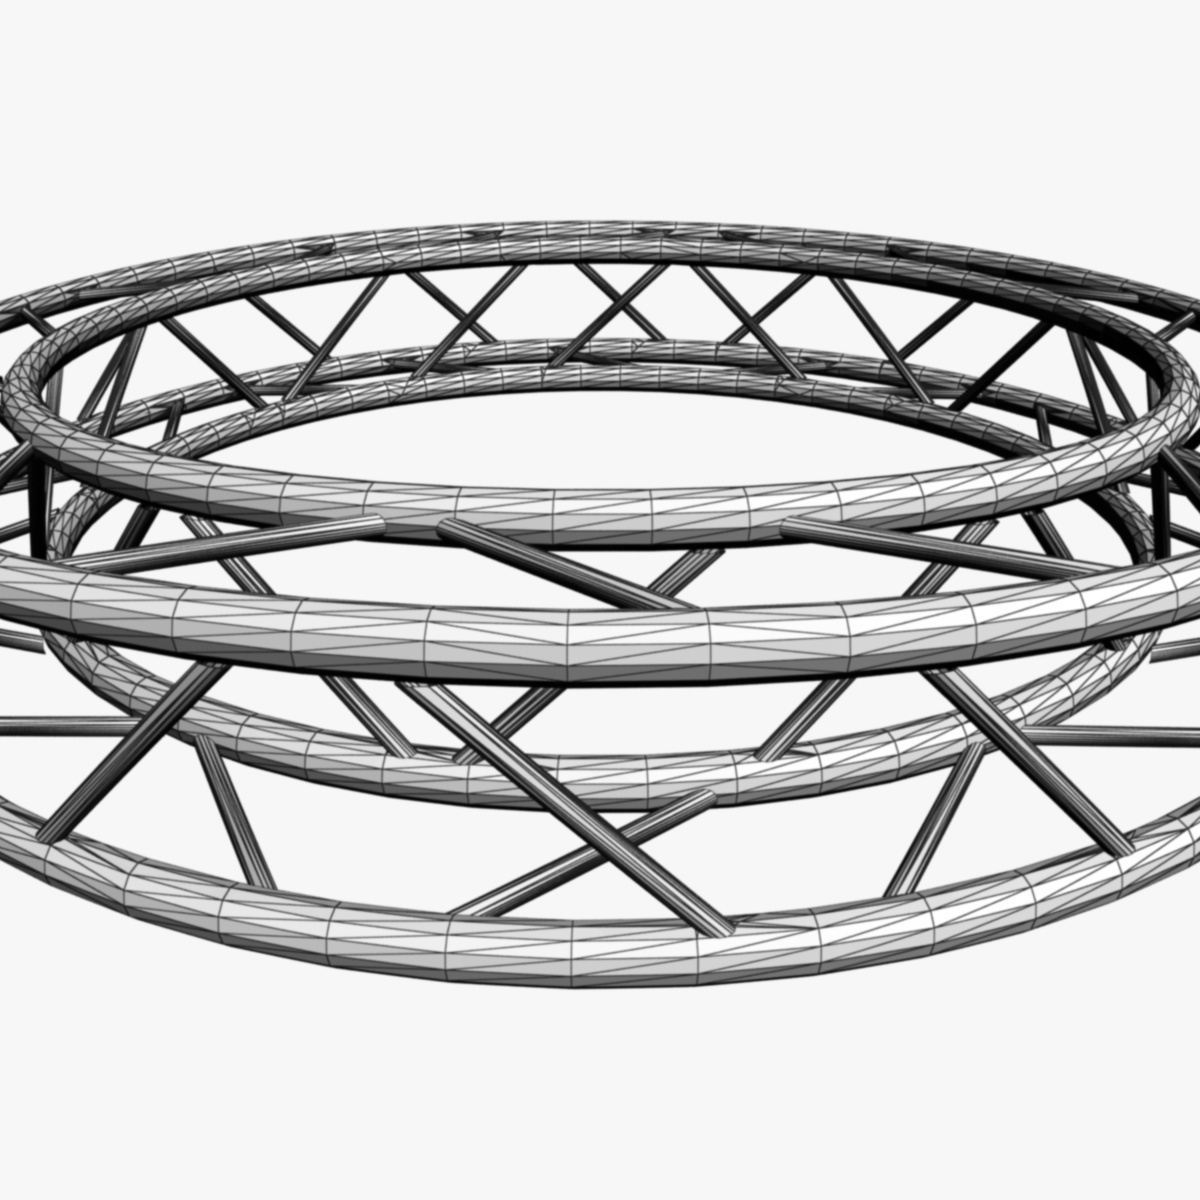 дугуй дөрвөлжин Дотоод (бүрэн диаметр 200cm) 3d загвар 3ds max dxf fbx c4d dae obj 252368